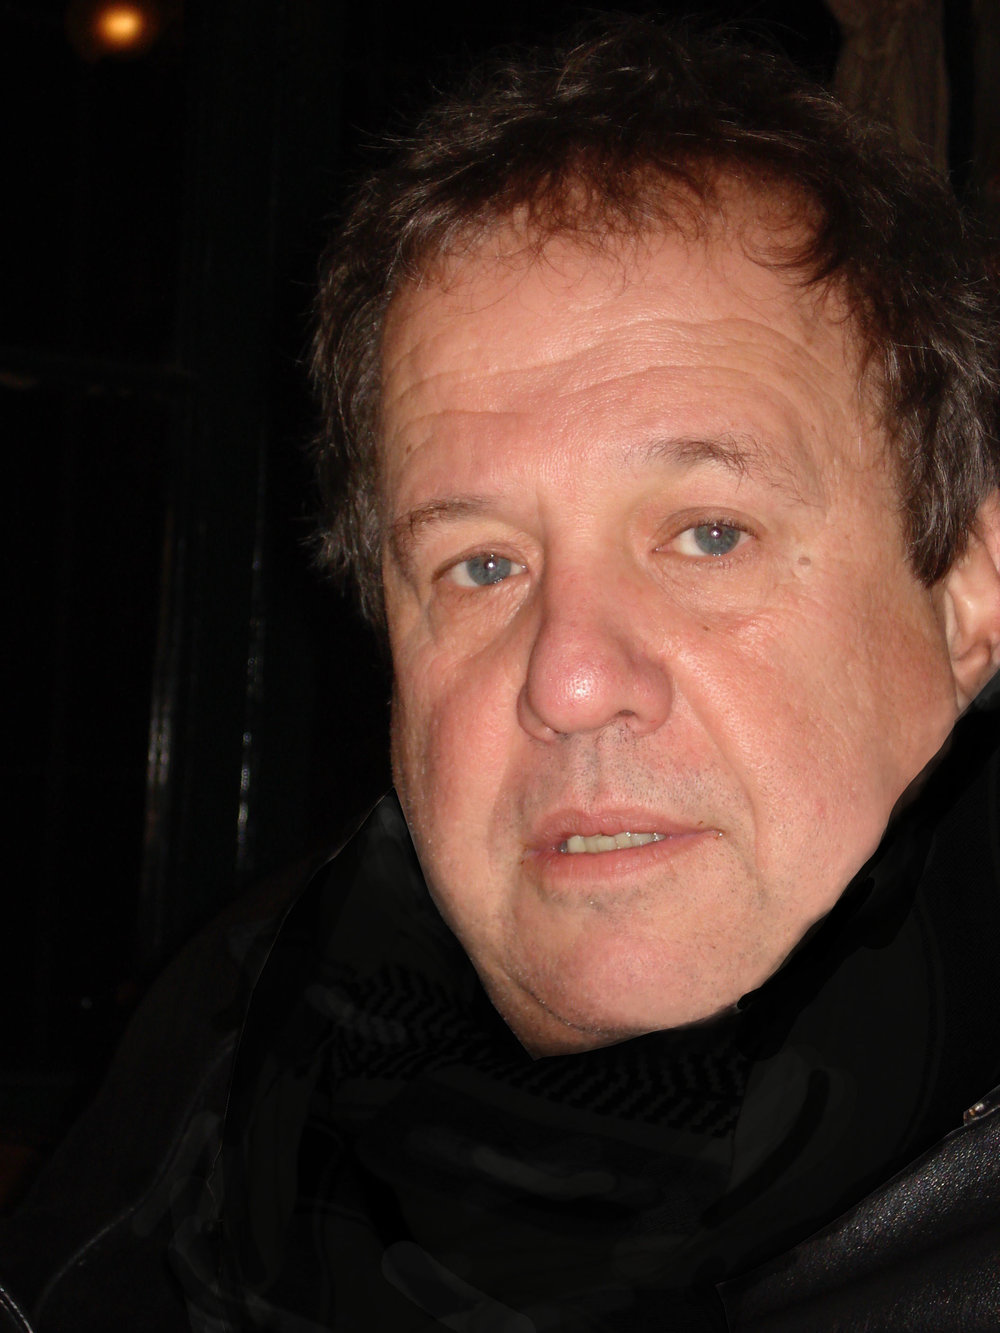 Dr. Mark Rittenberg